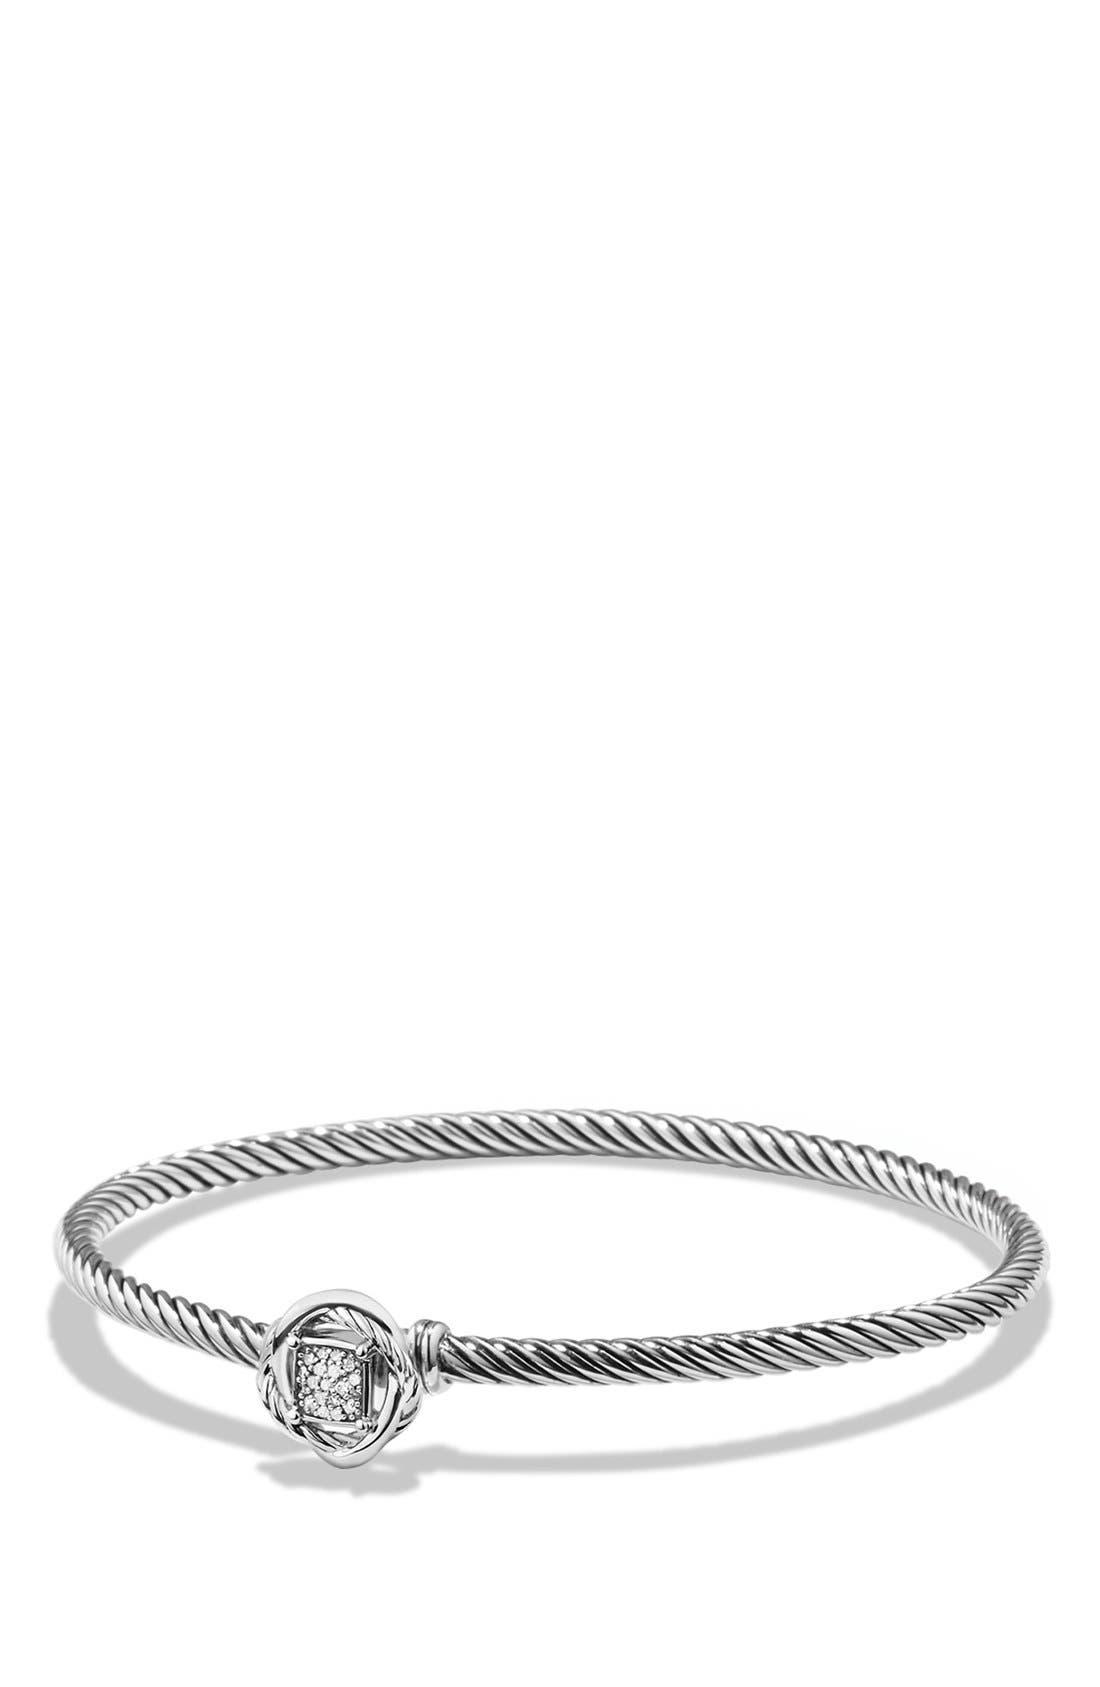 Main Image - David Yurman'Infinity' Bracelet with Diamonds